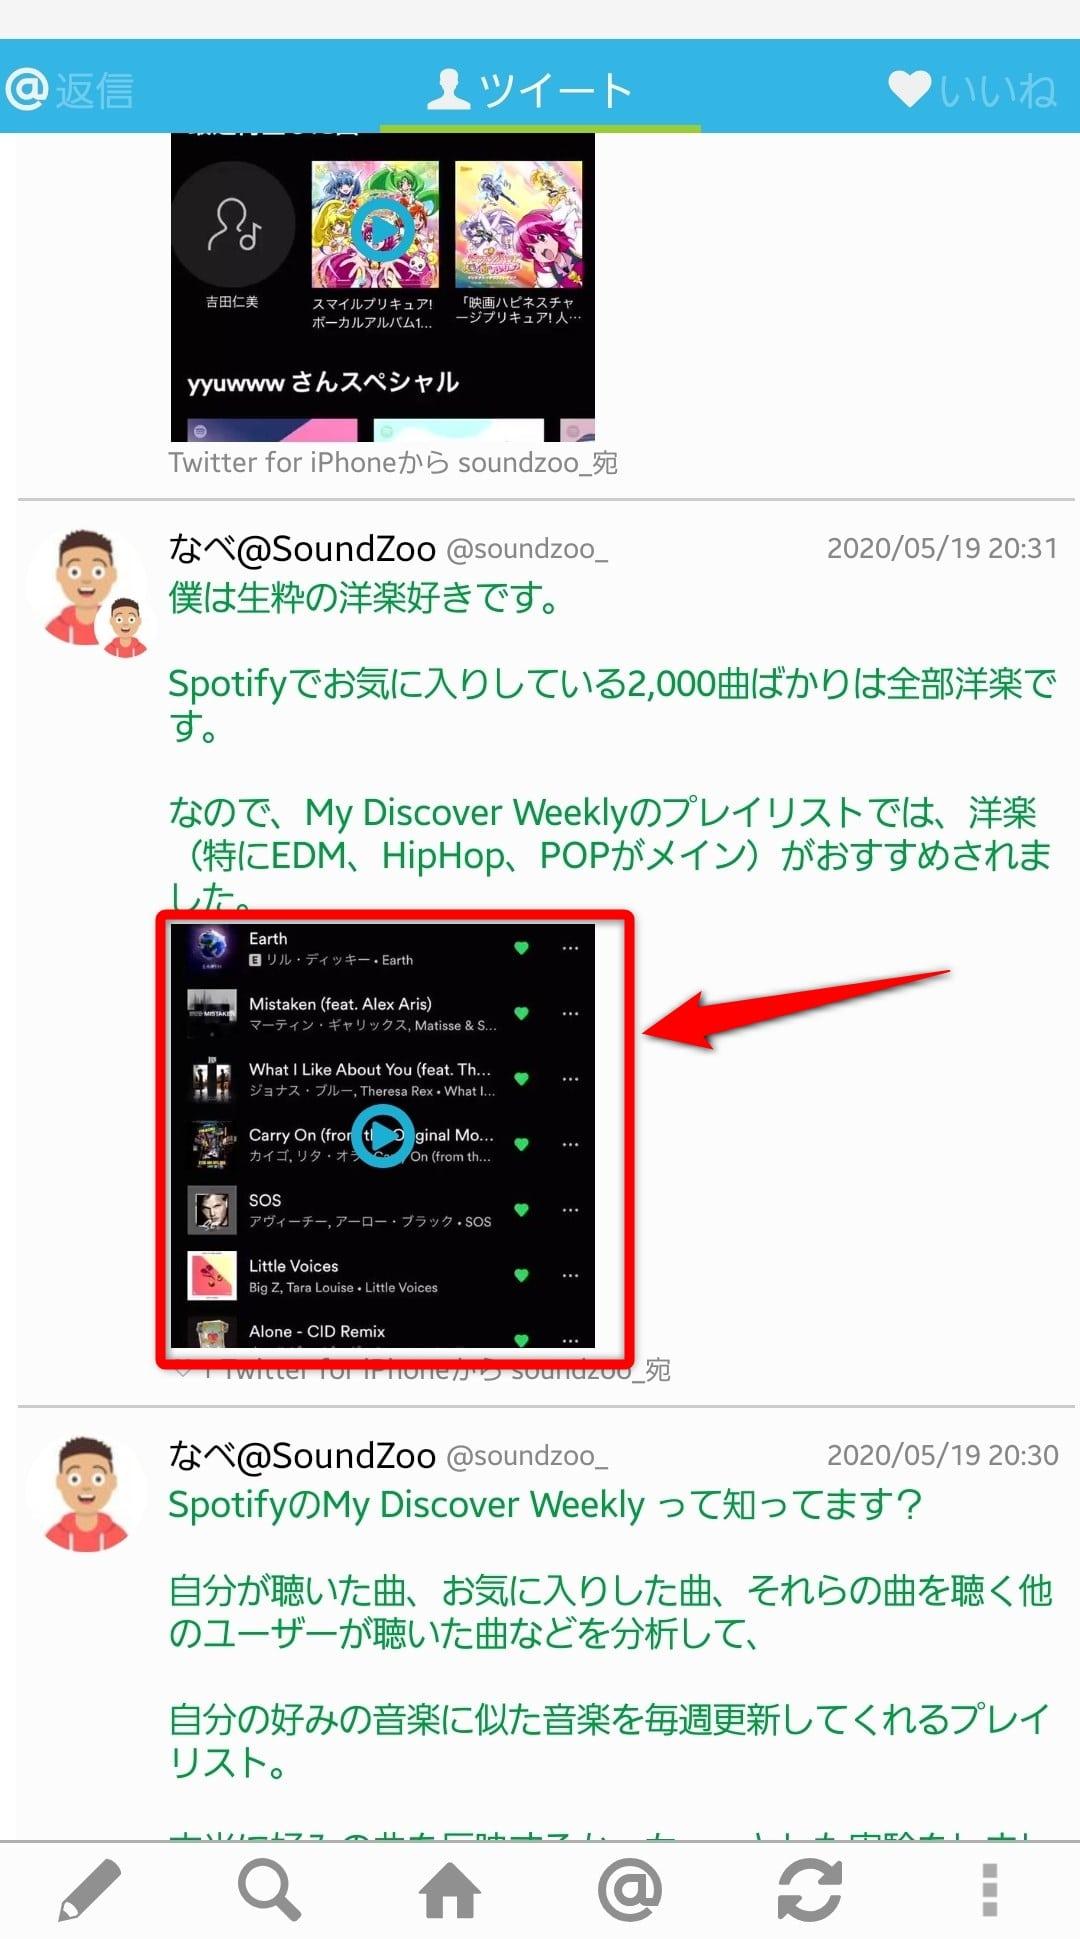 AndroidでTwitterの動画をダウンロードする方法